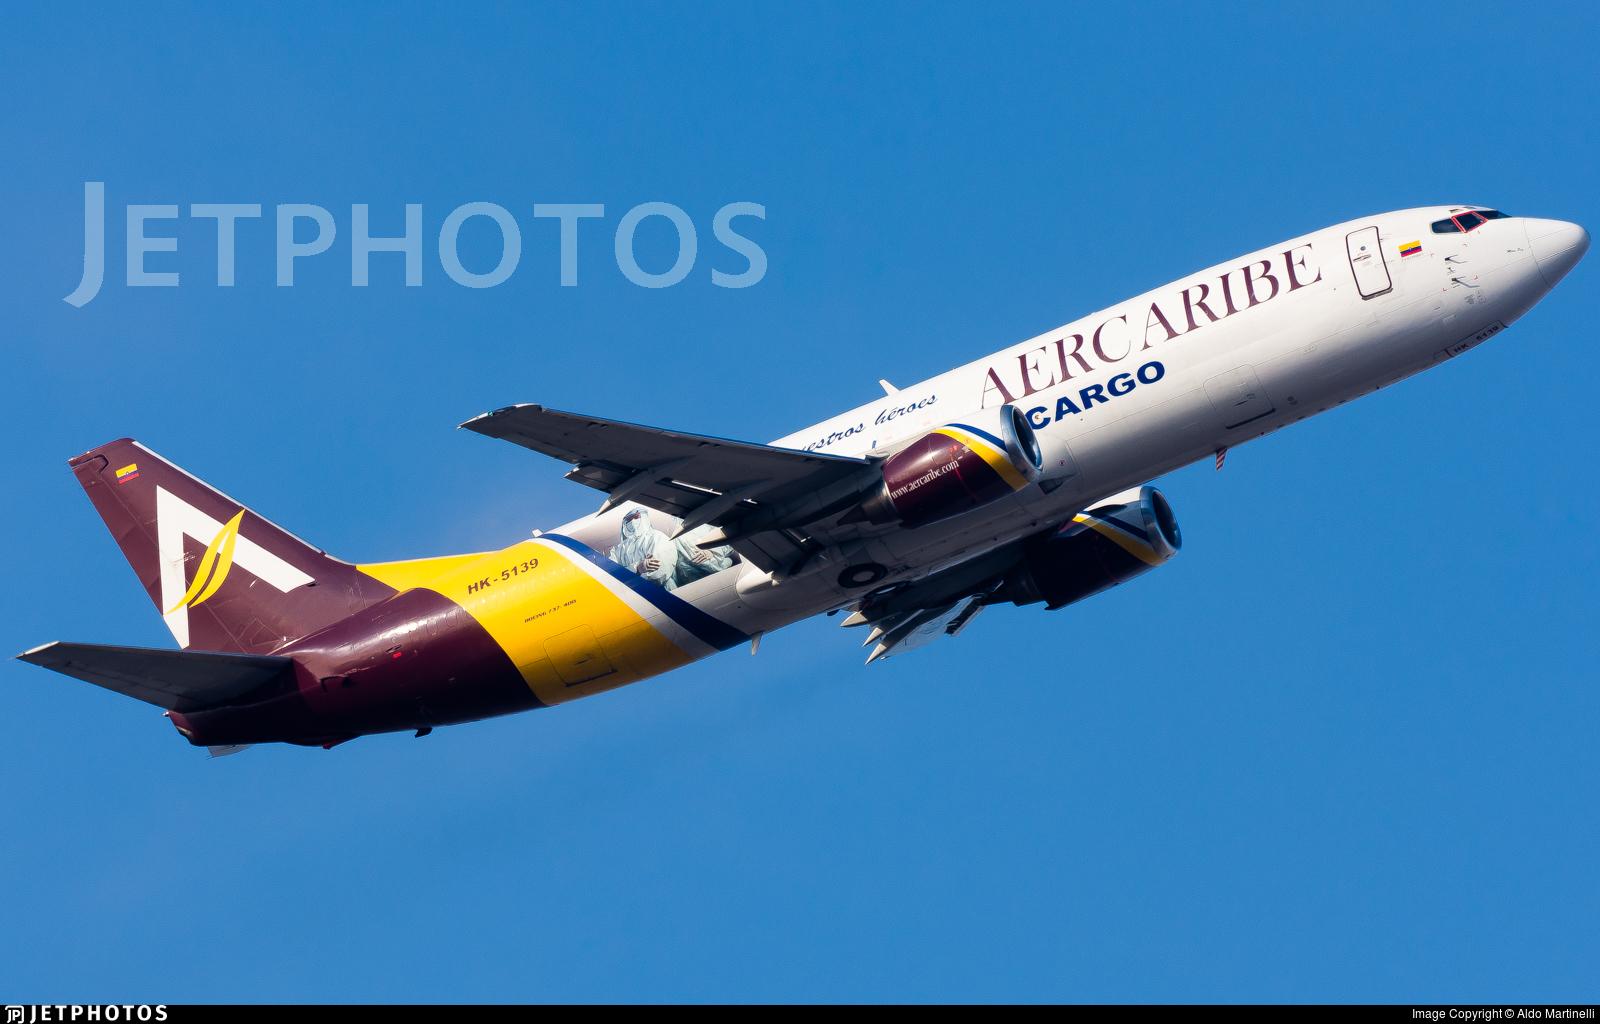 HK-5139 - Boeing 737-476(SF) - Aer Caribe